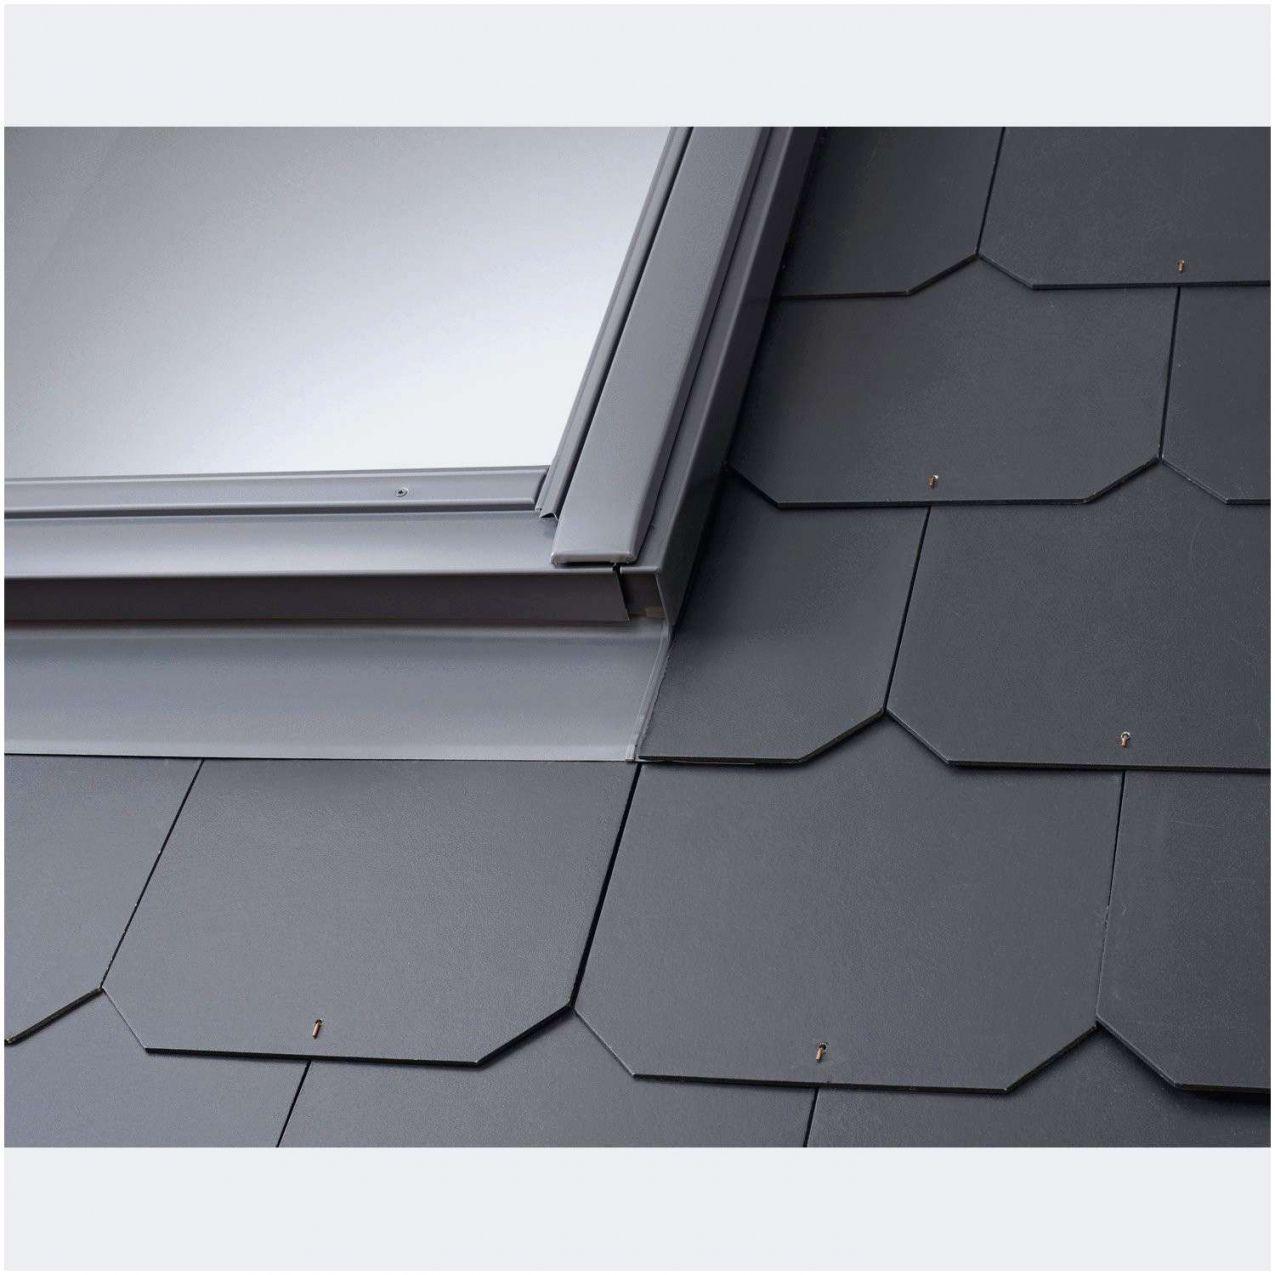 50 Store Banne Double Pente Castorama 2020 | Roof Window ... pour Store De Jardin Double Pente